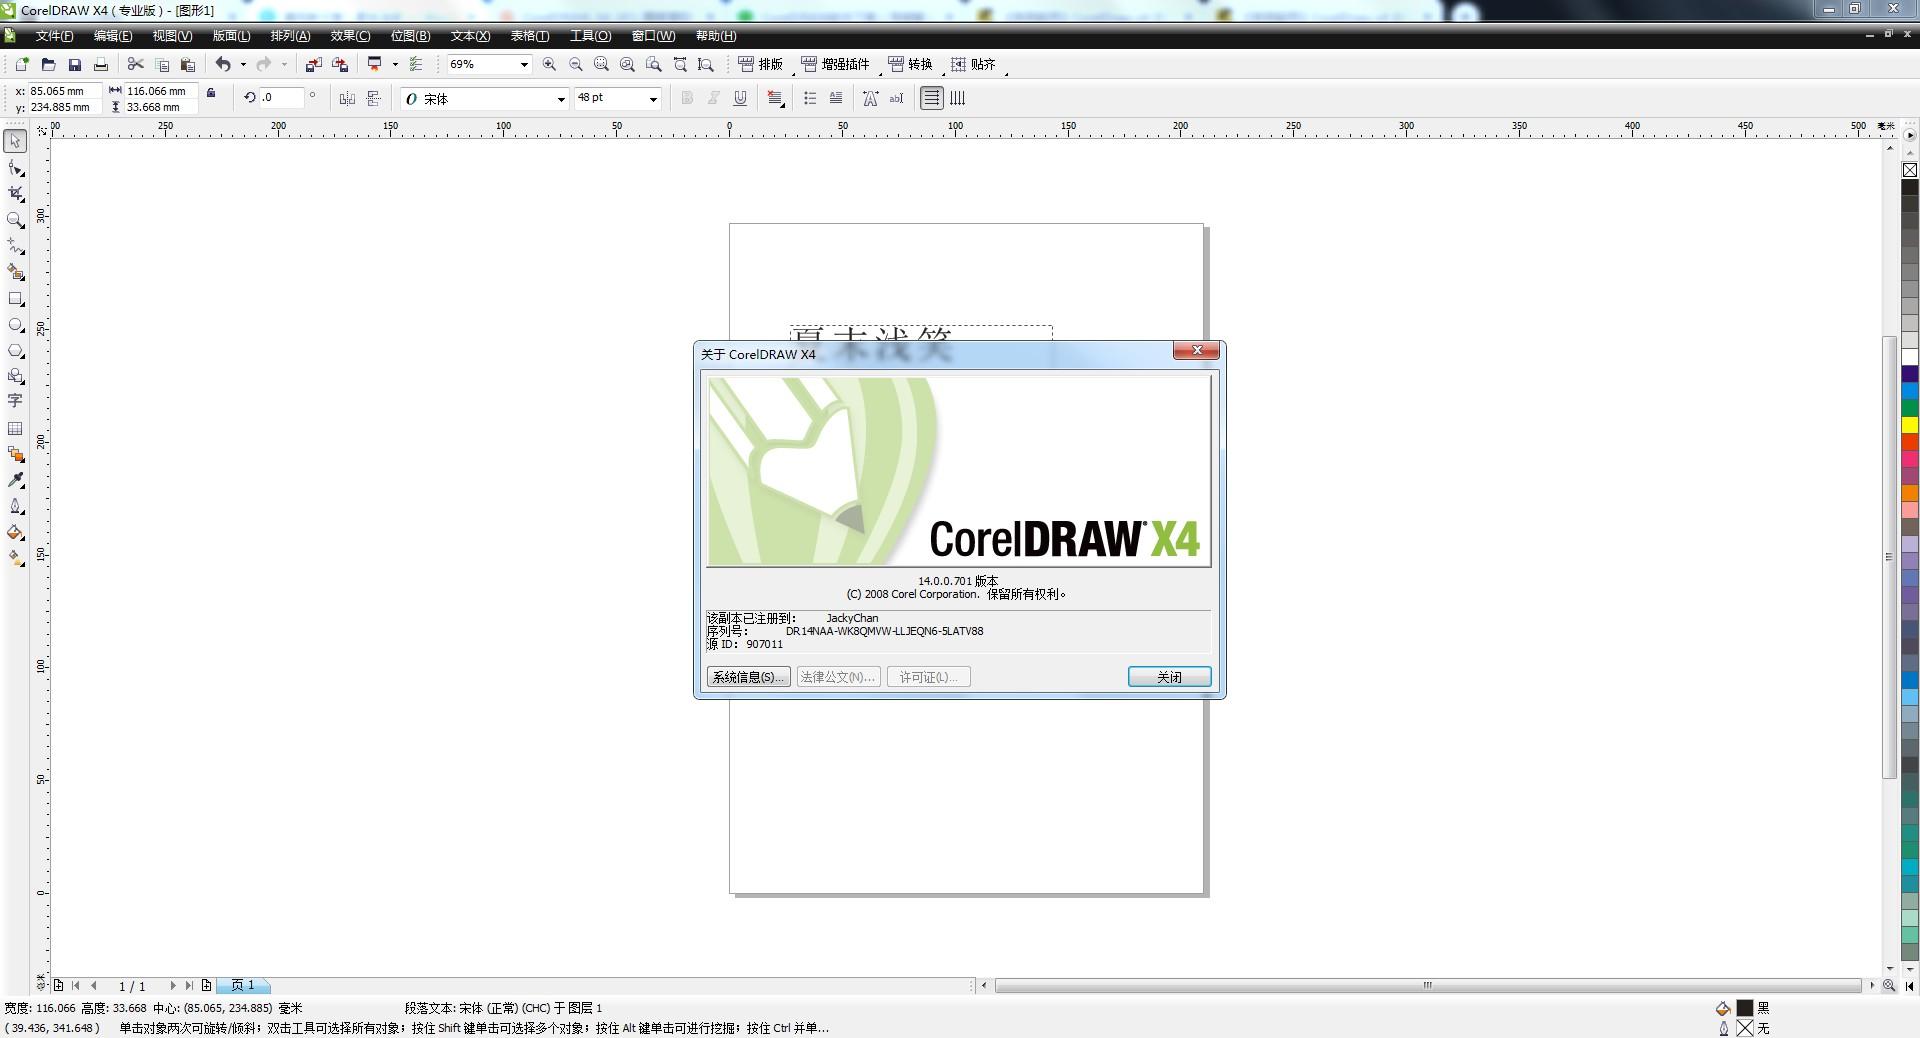 CorelDRAW_X4_SP2_精简增强版 官方简体中文正式破解版